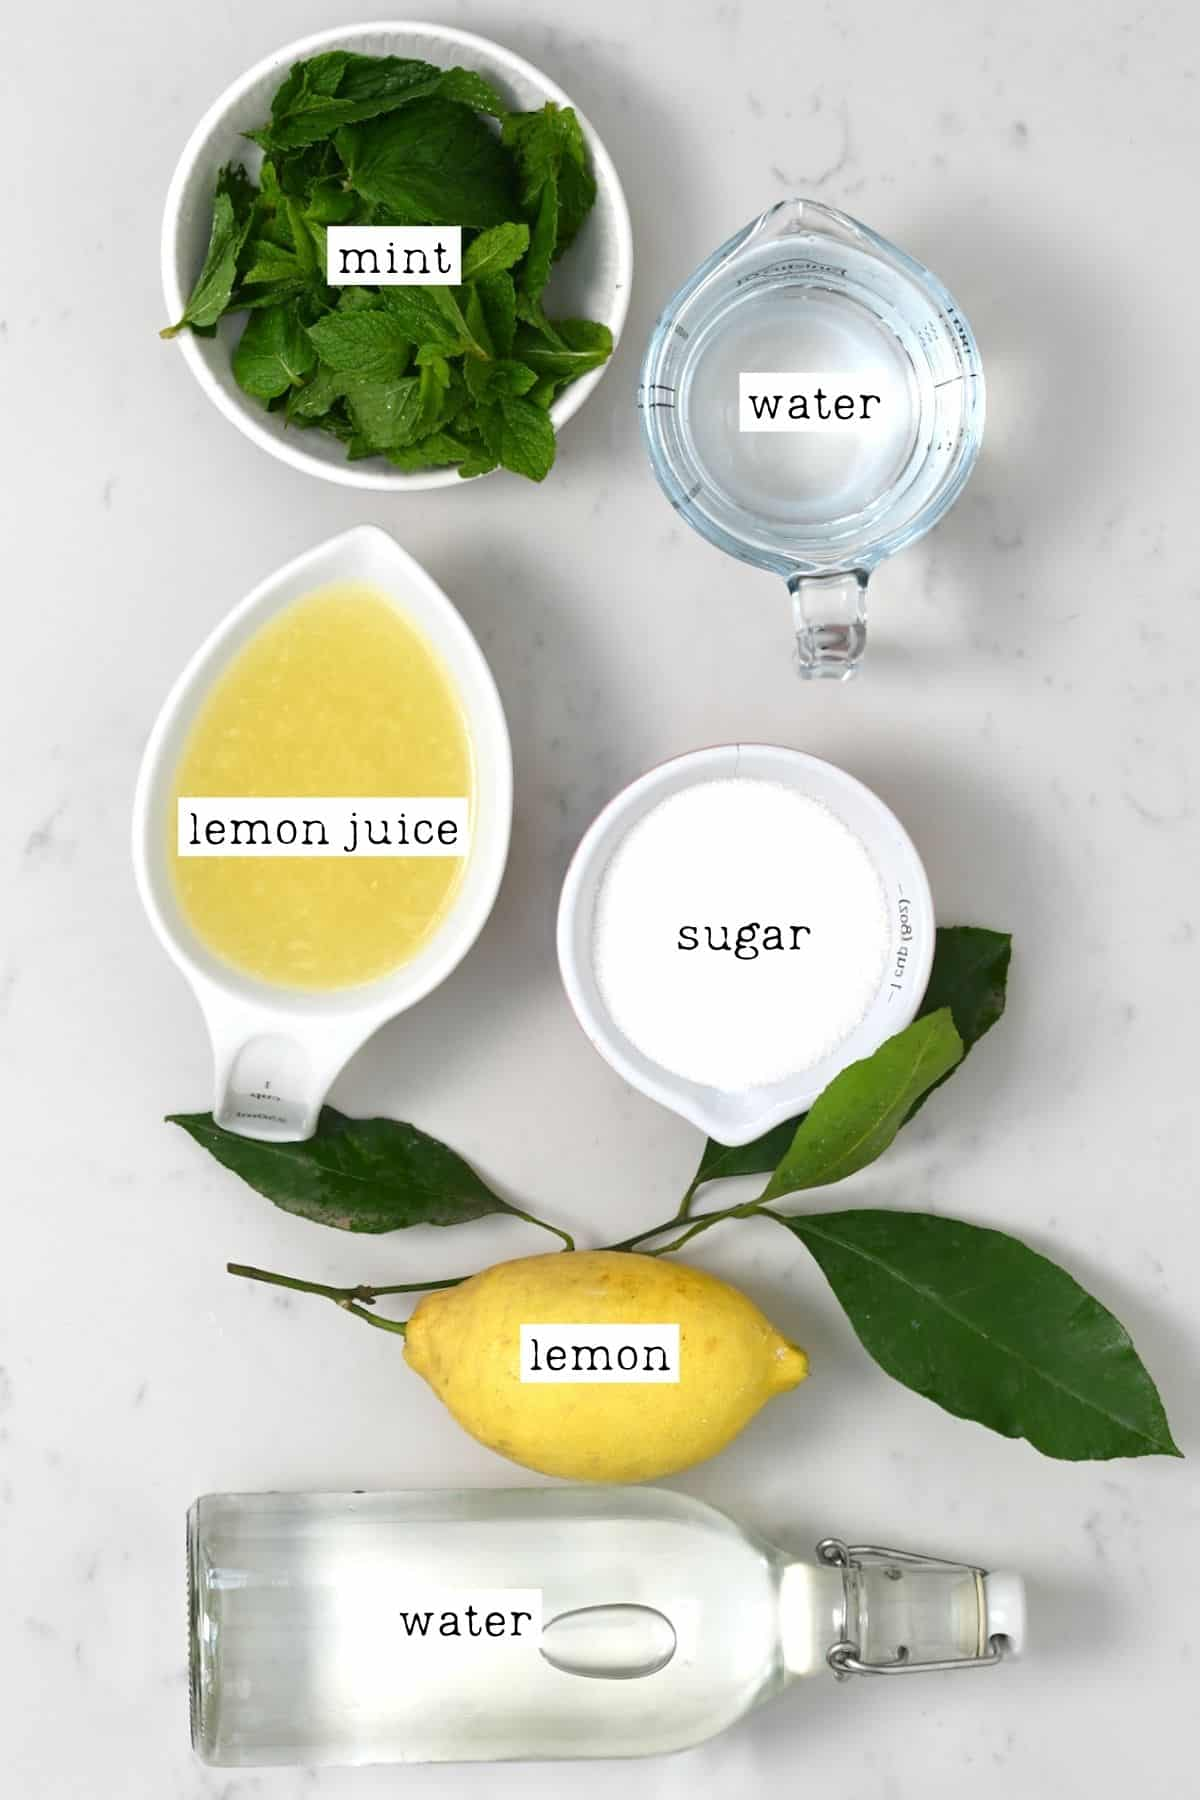 Ingredients for mint lemonade